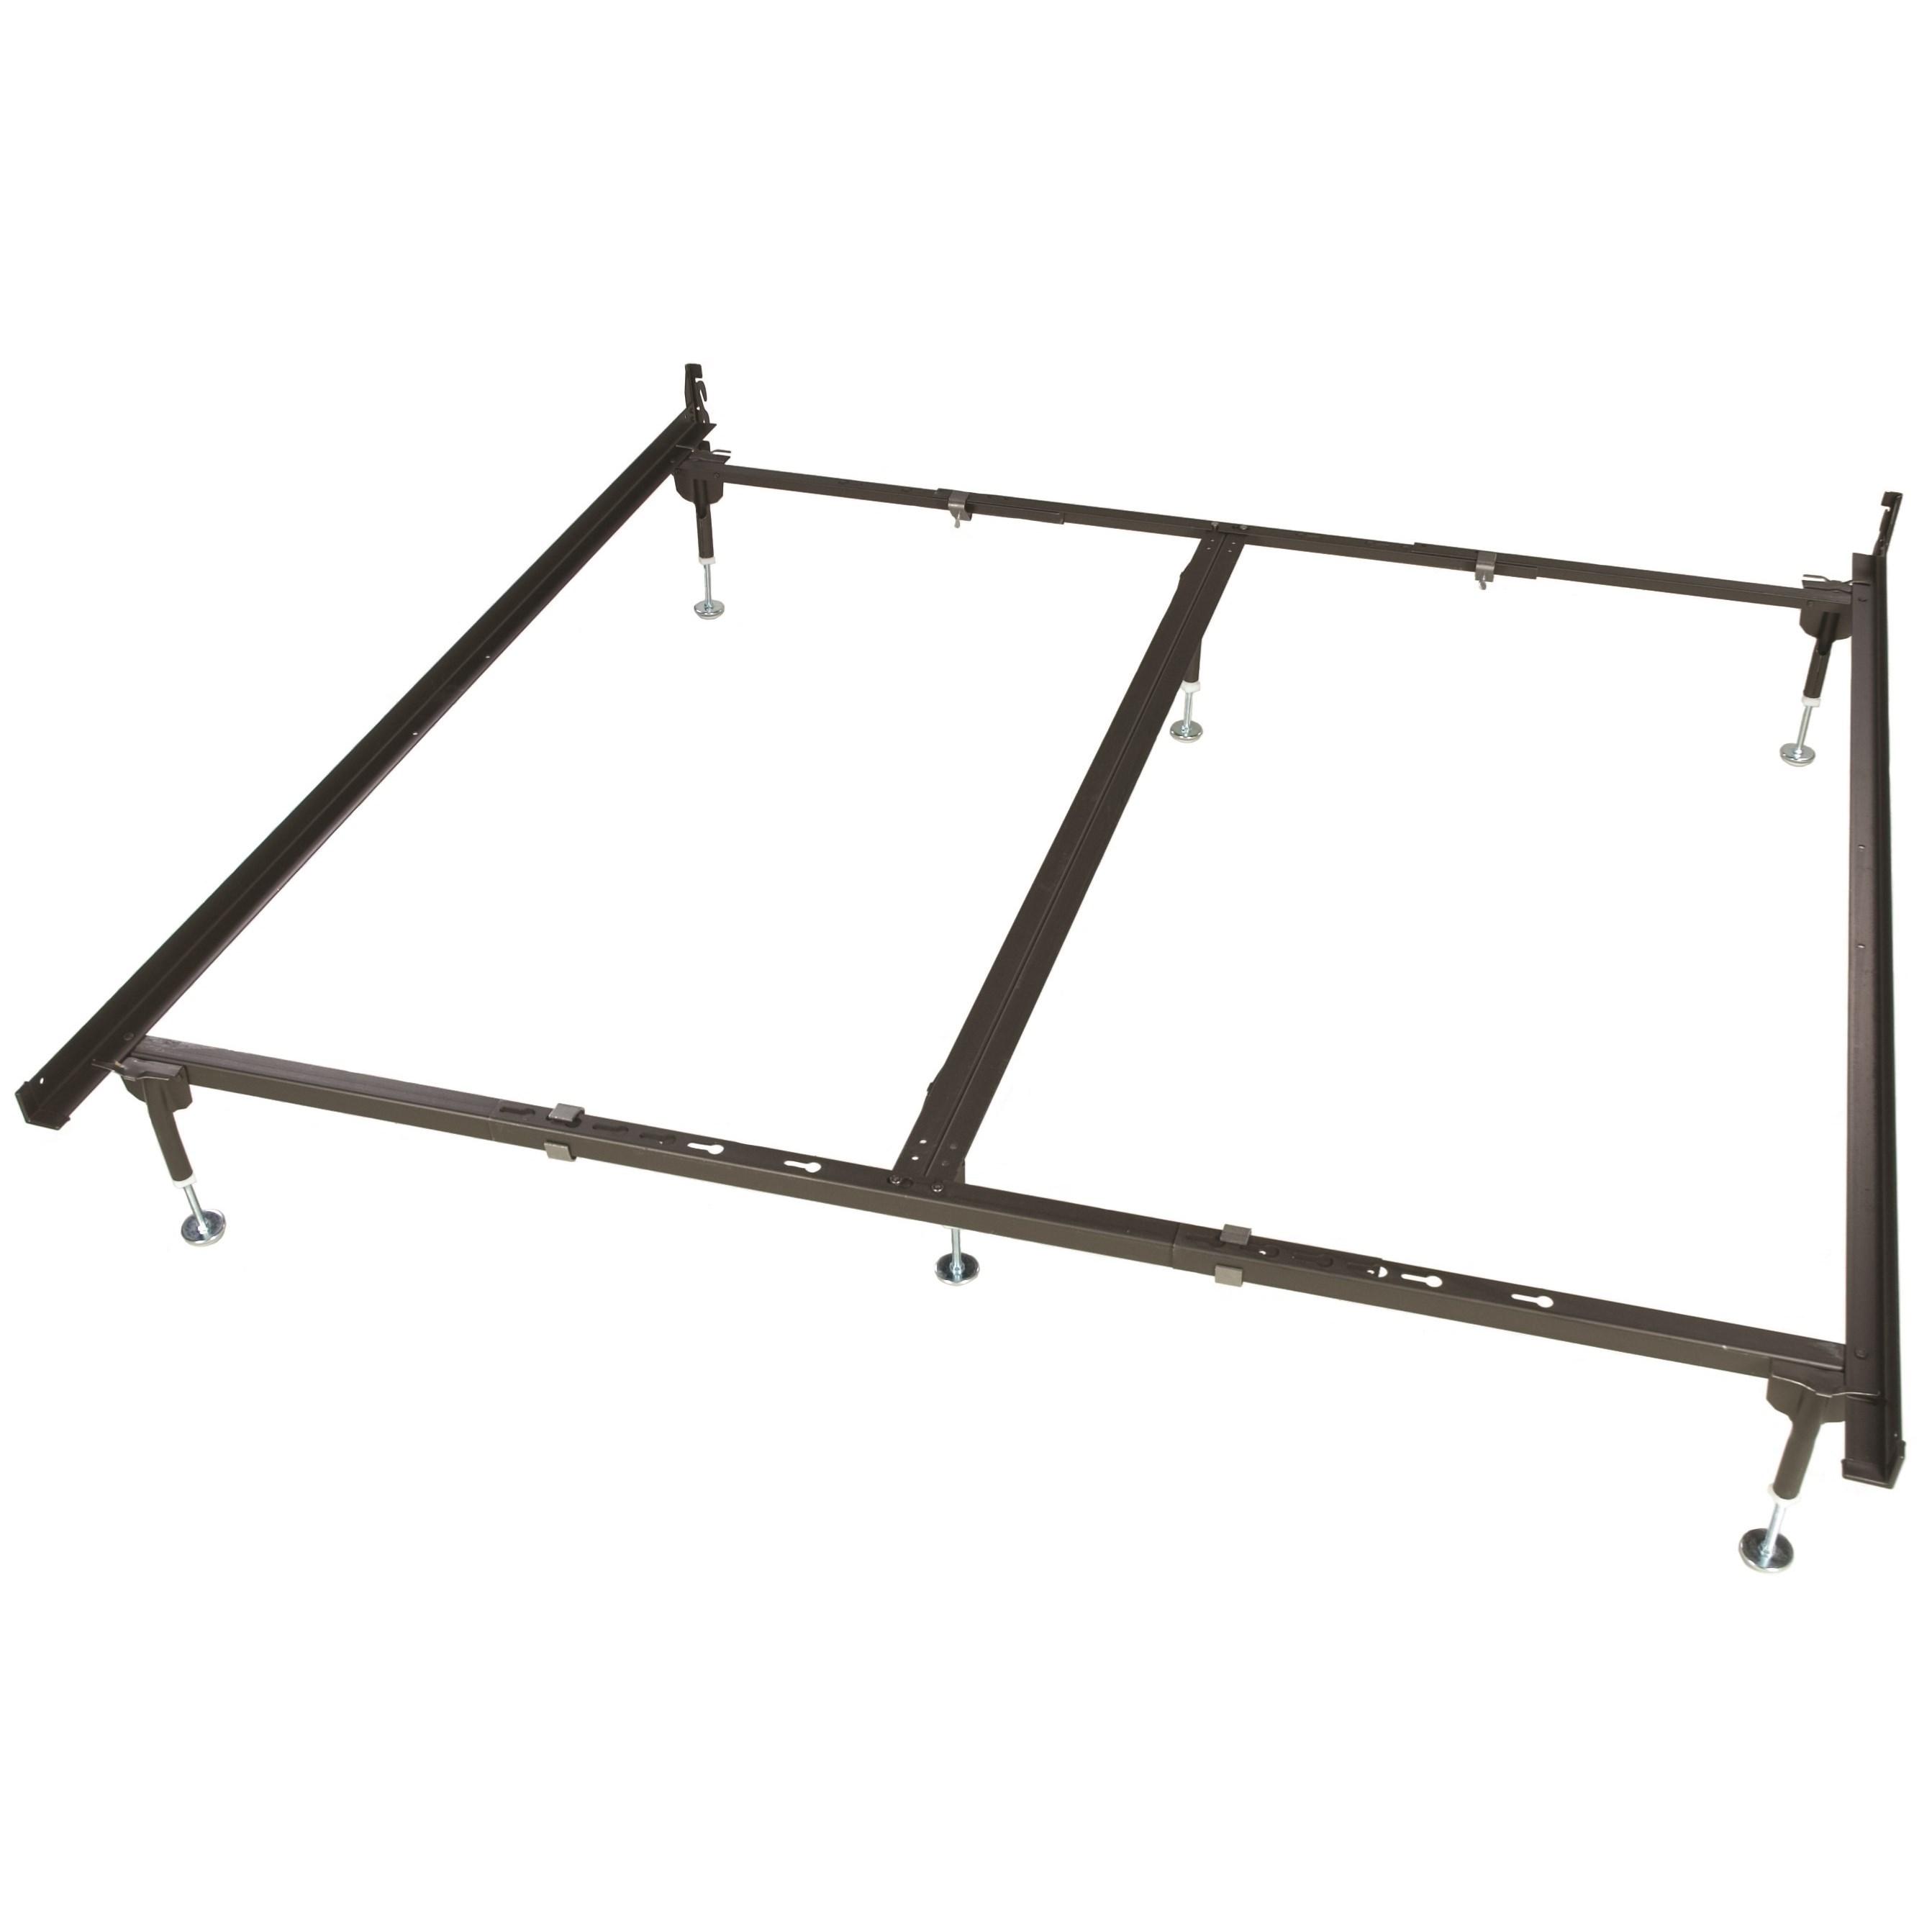 Qn/King/CK Bed Frame for Hook-In Headboard